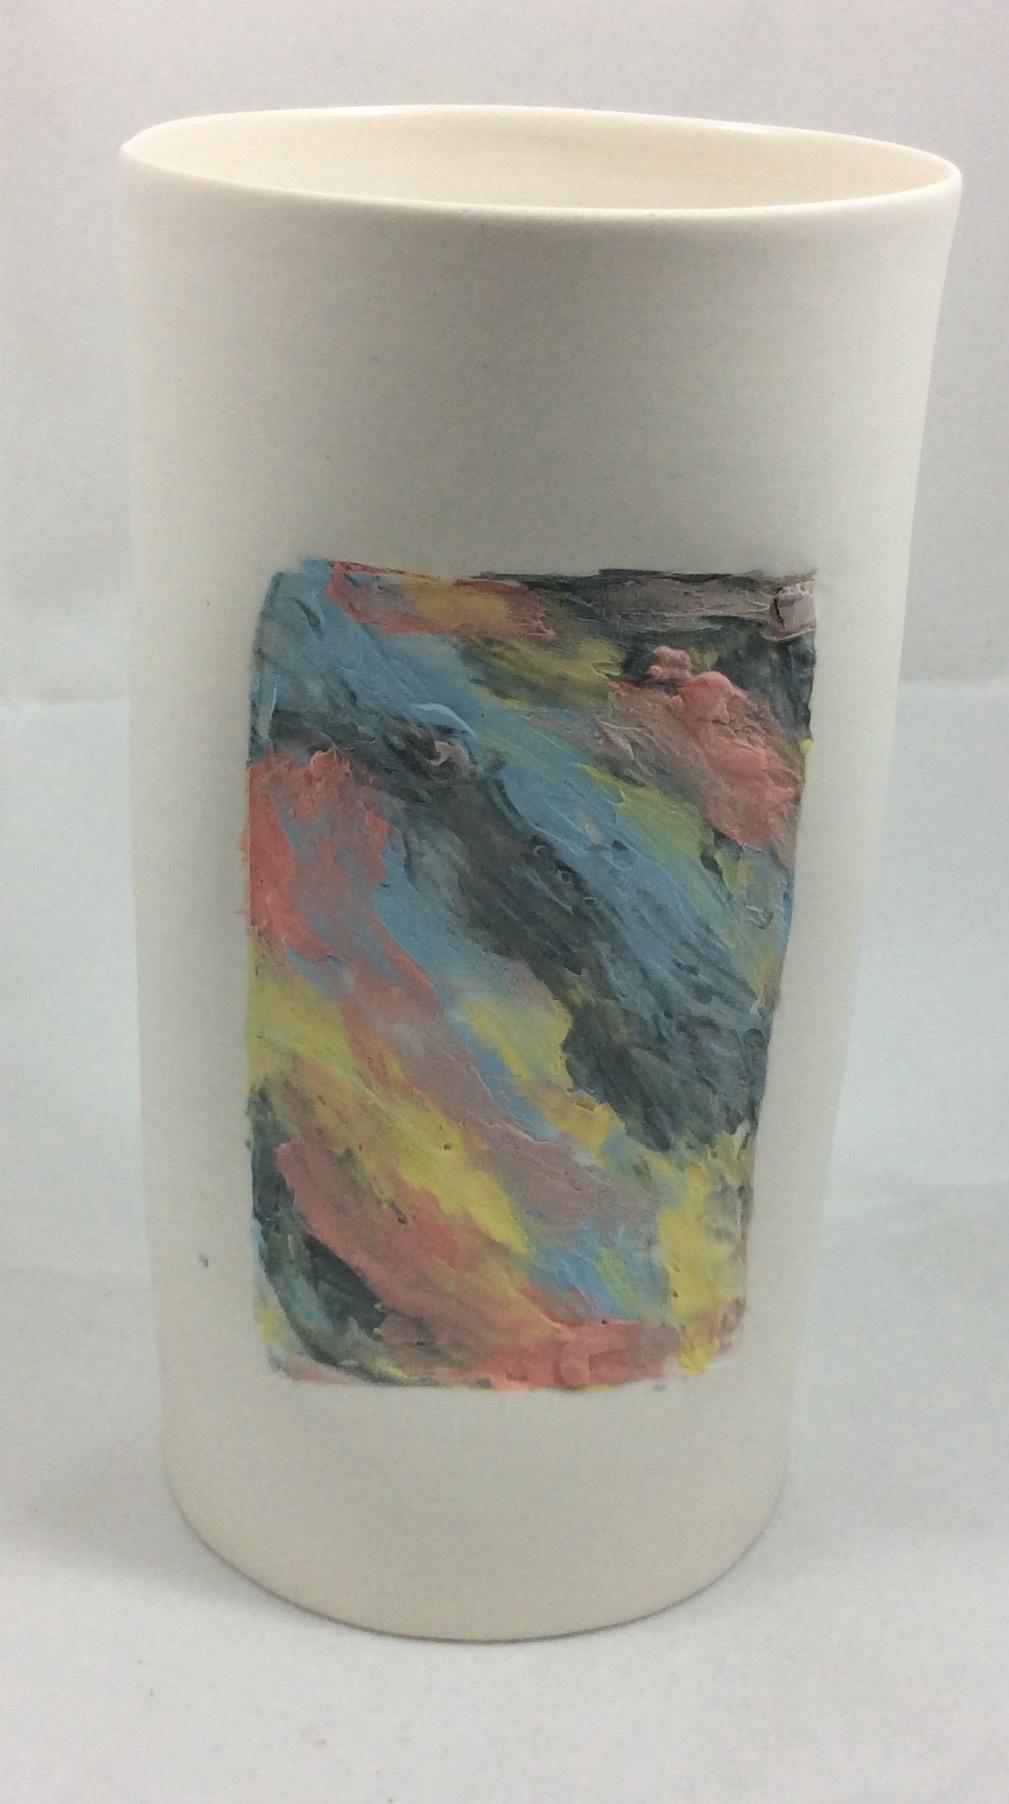 Cylinder Vase - Sunset